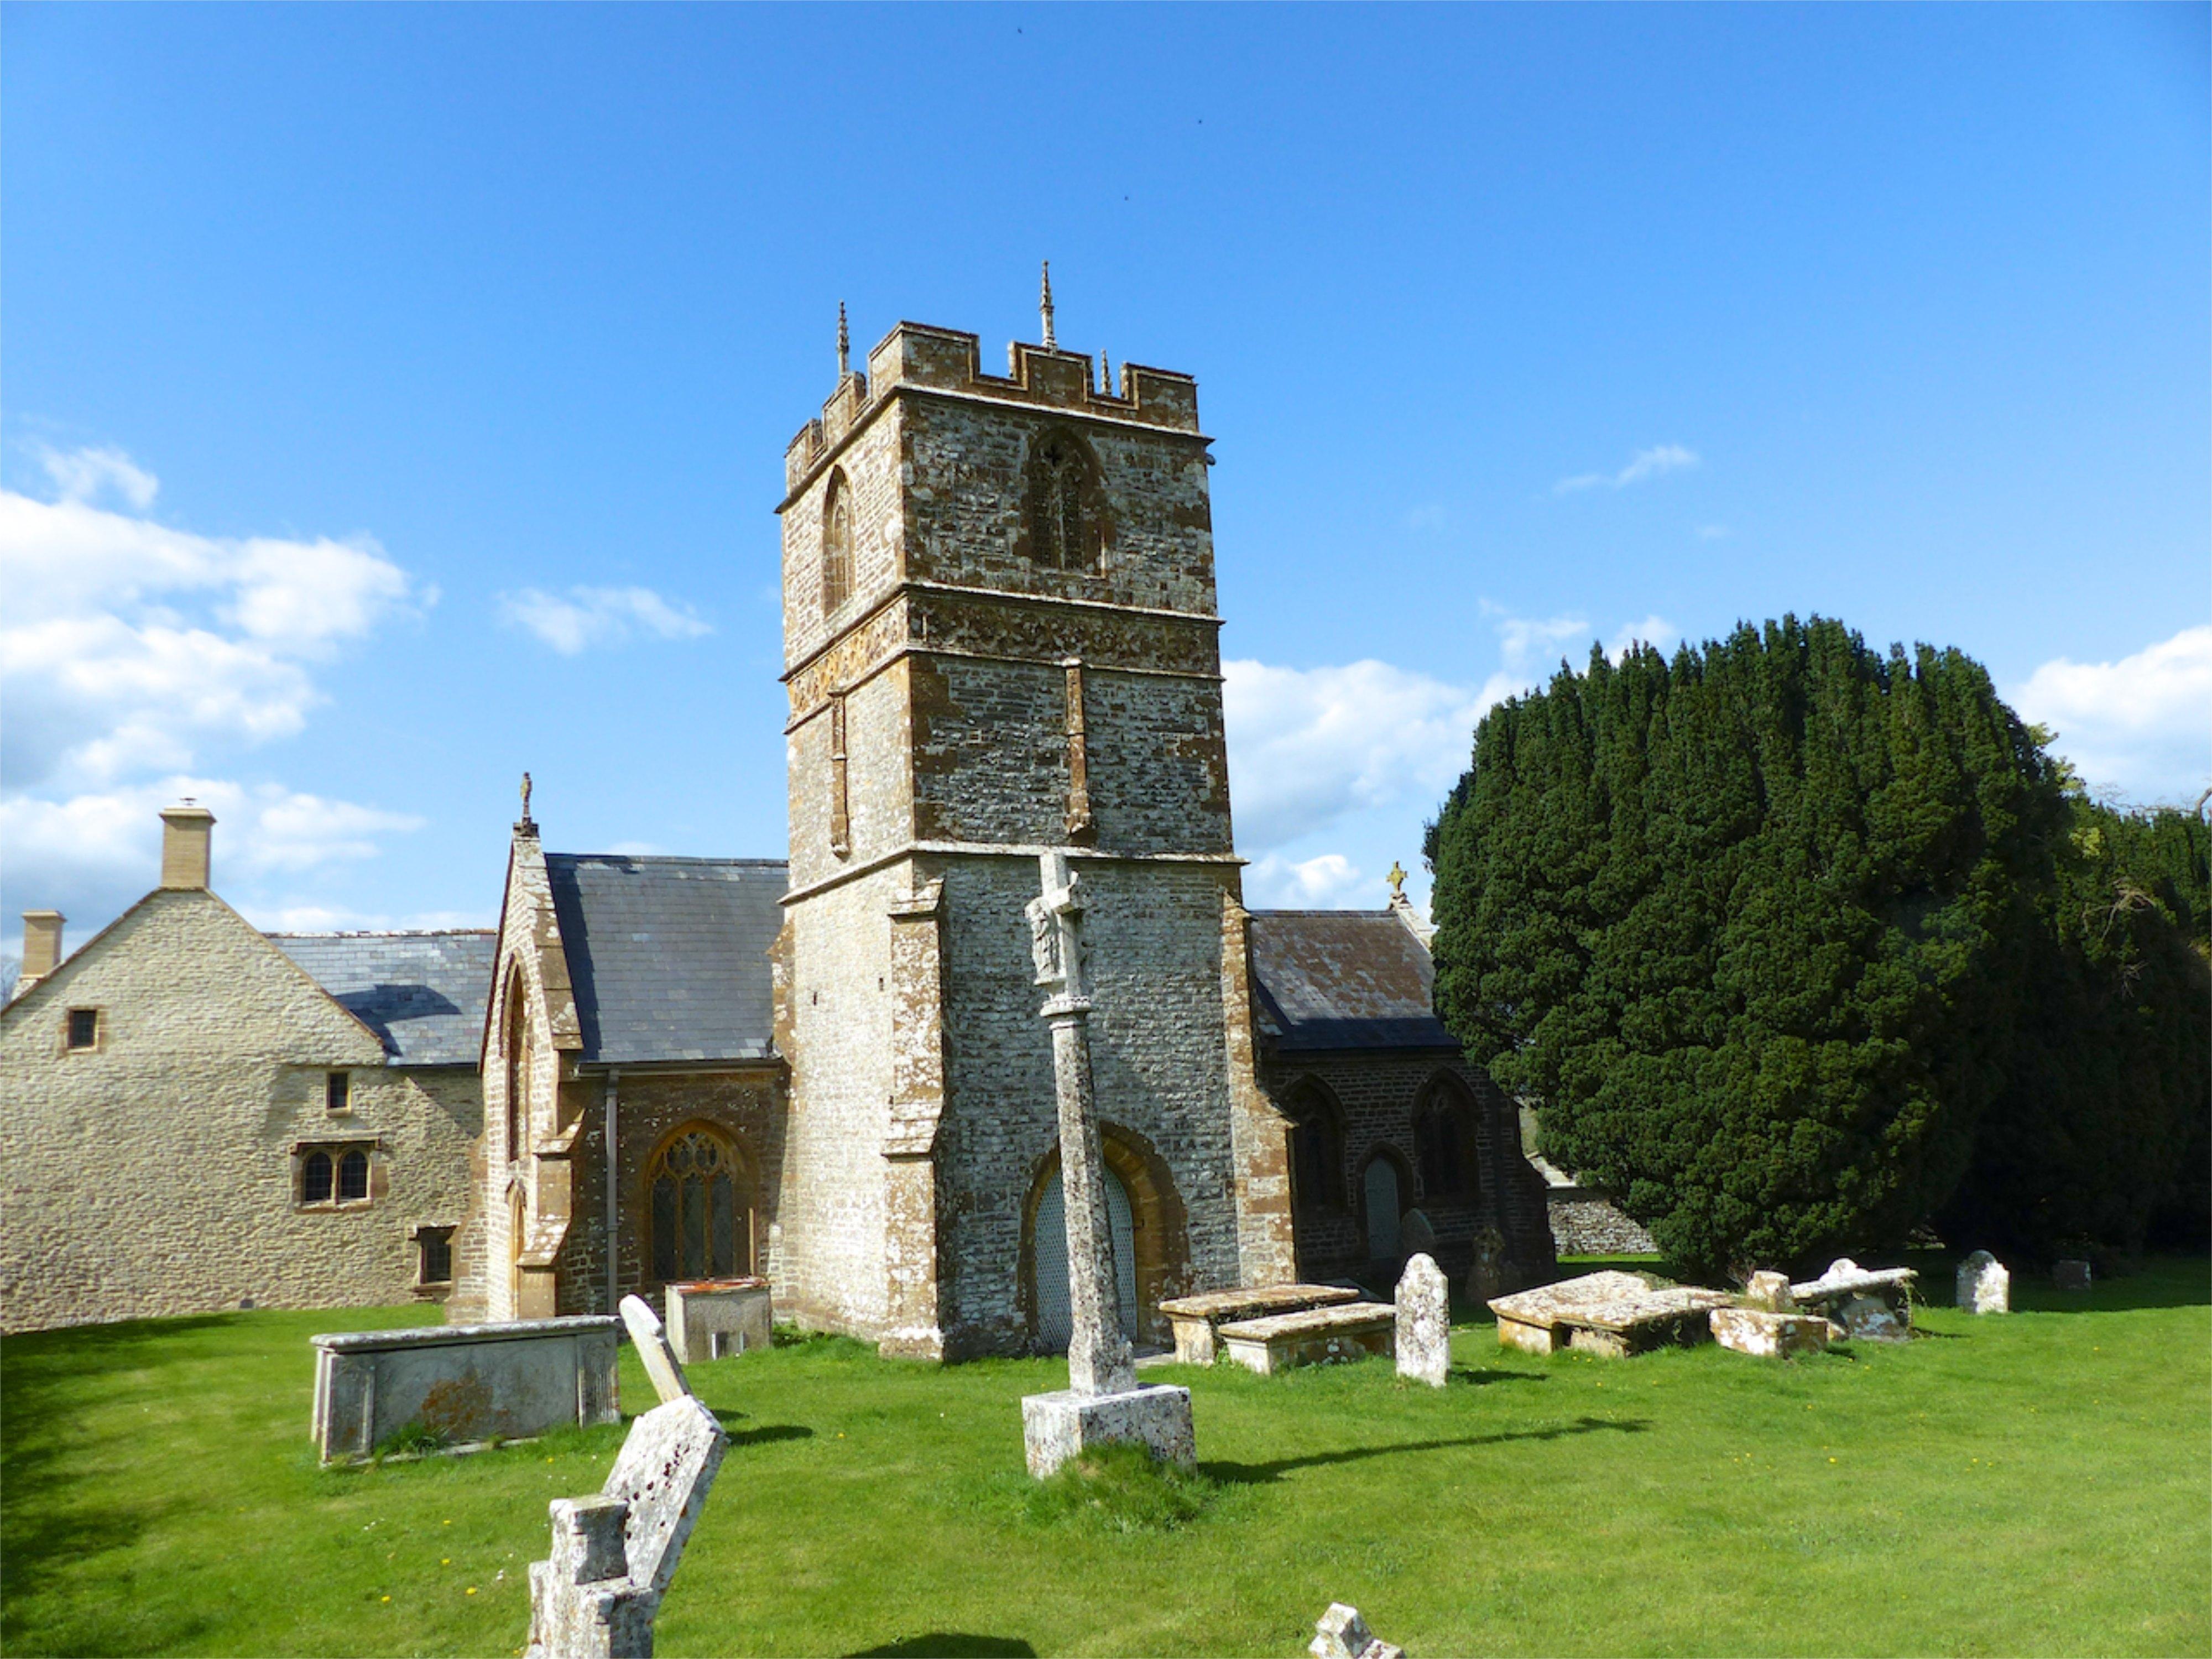 St Mary's Church Melbury Bubb Dorset 03